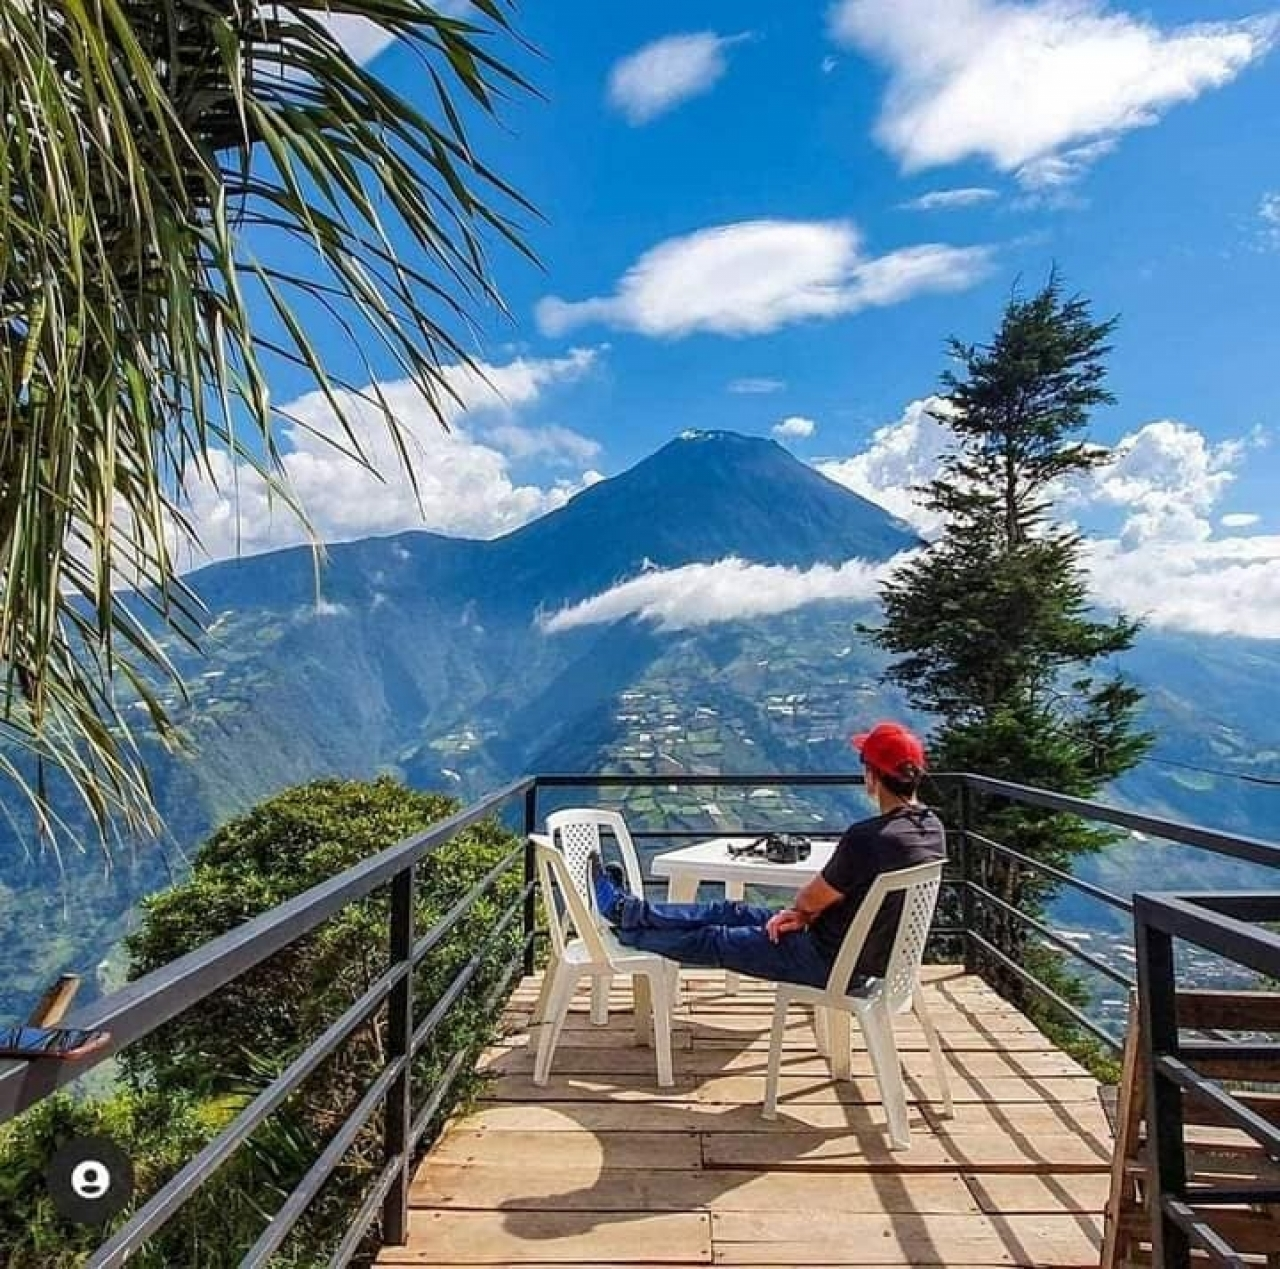 Baños de agua santa Mirador Ojos de volcán2